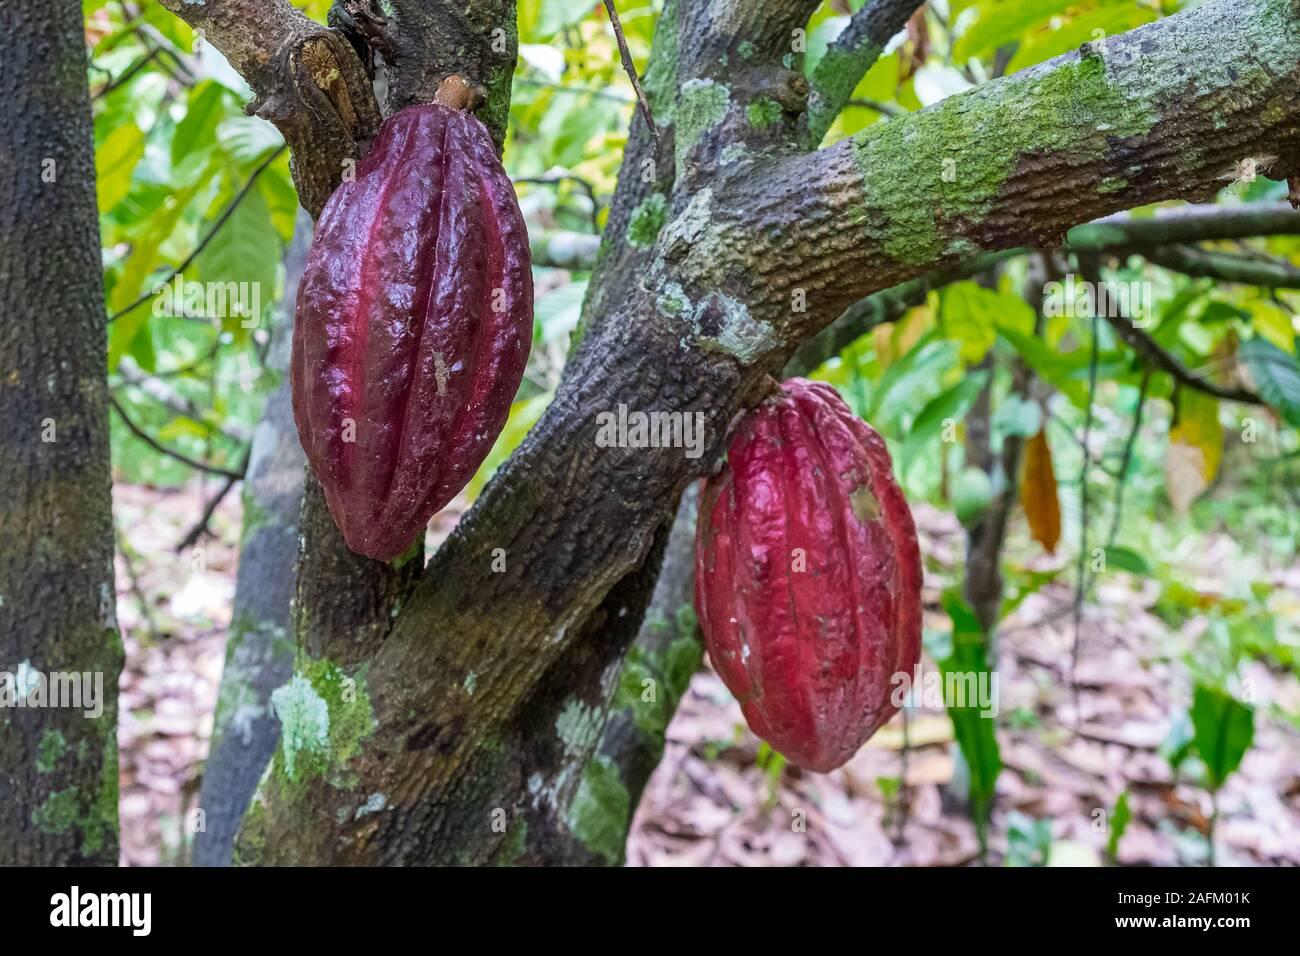 Cocoa bean ripe in tree in jungle before harvest in garden Stock Photo